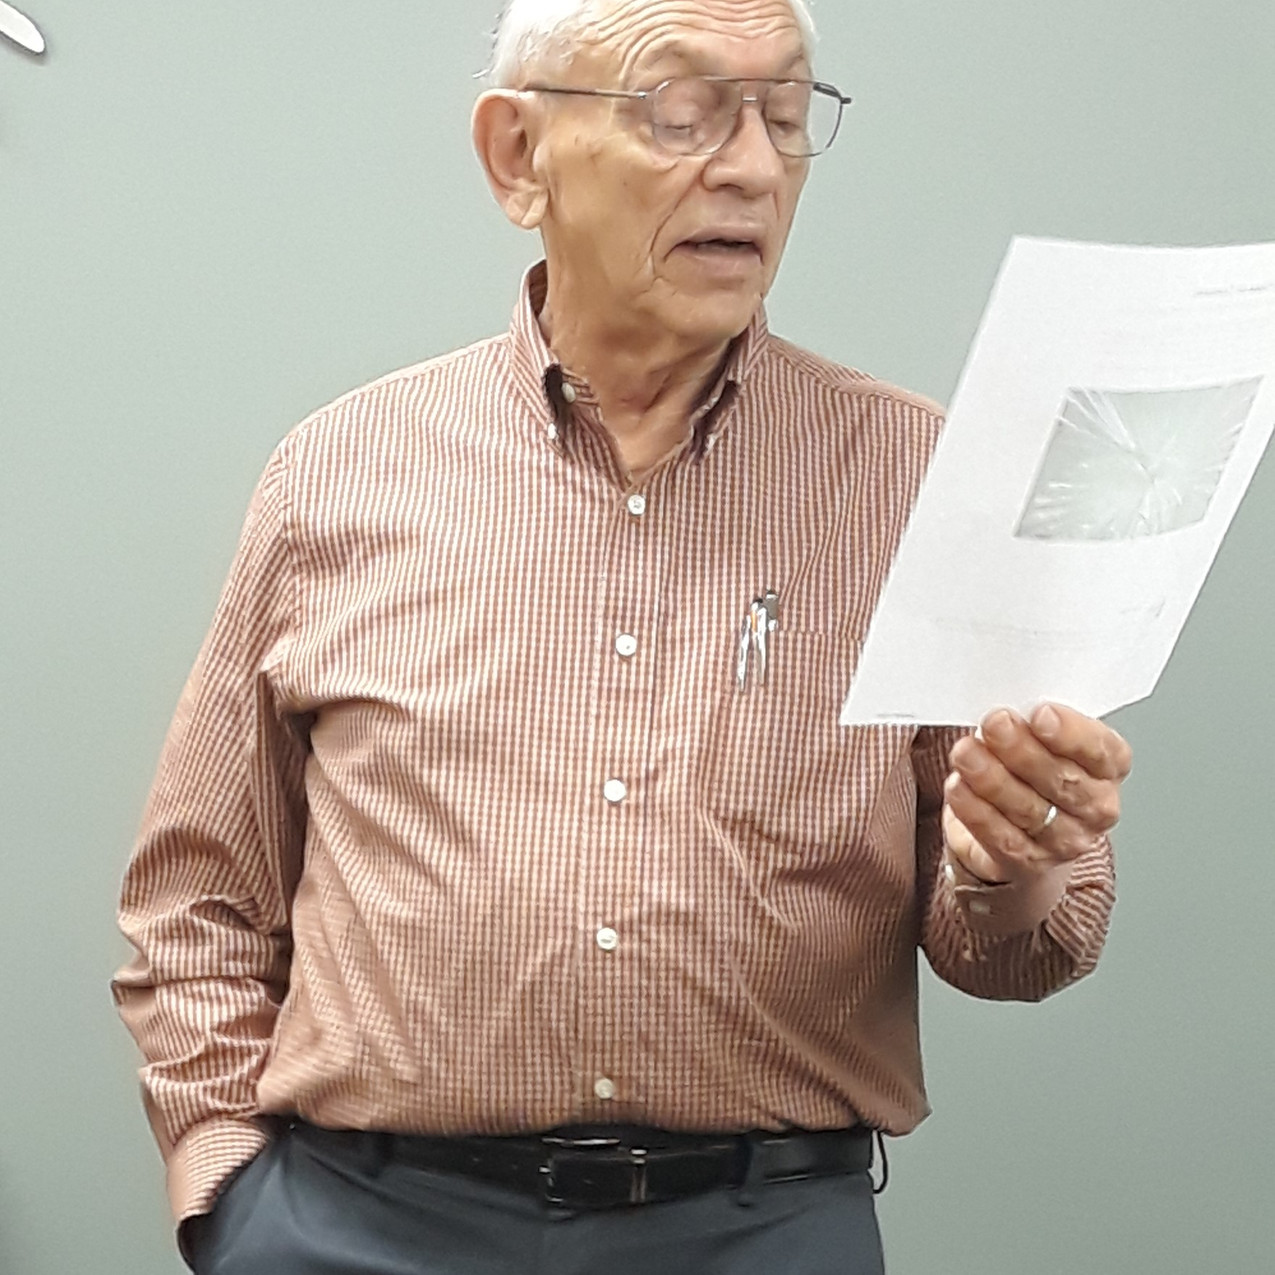 Don Haberman